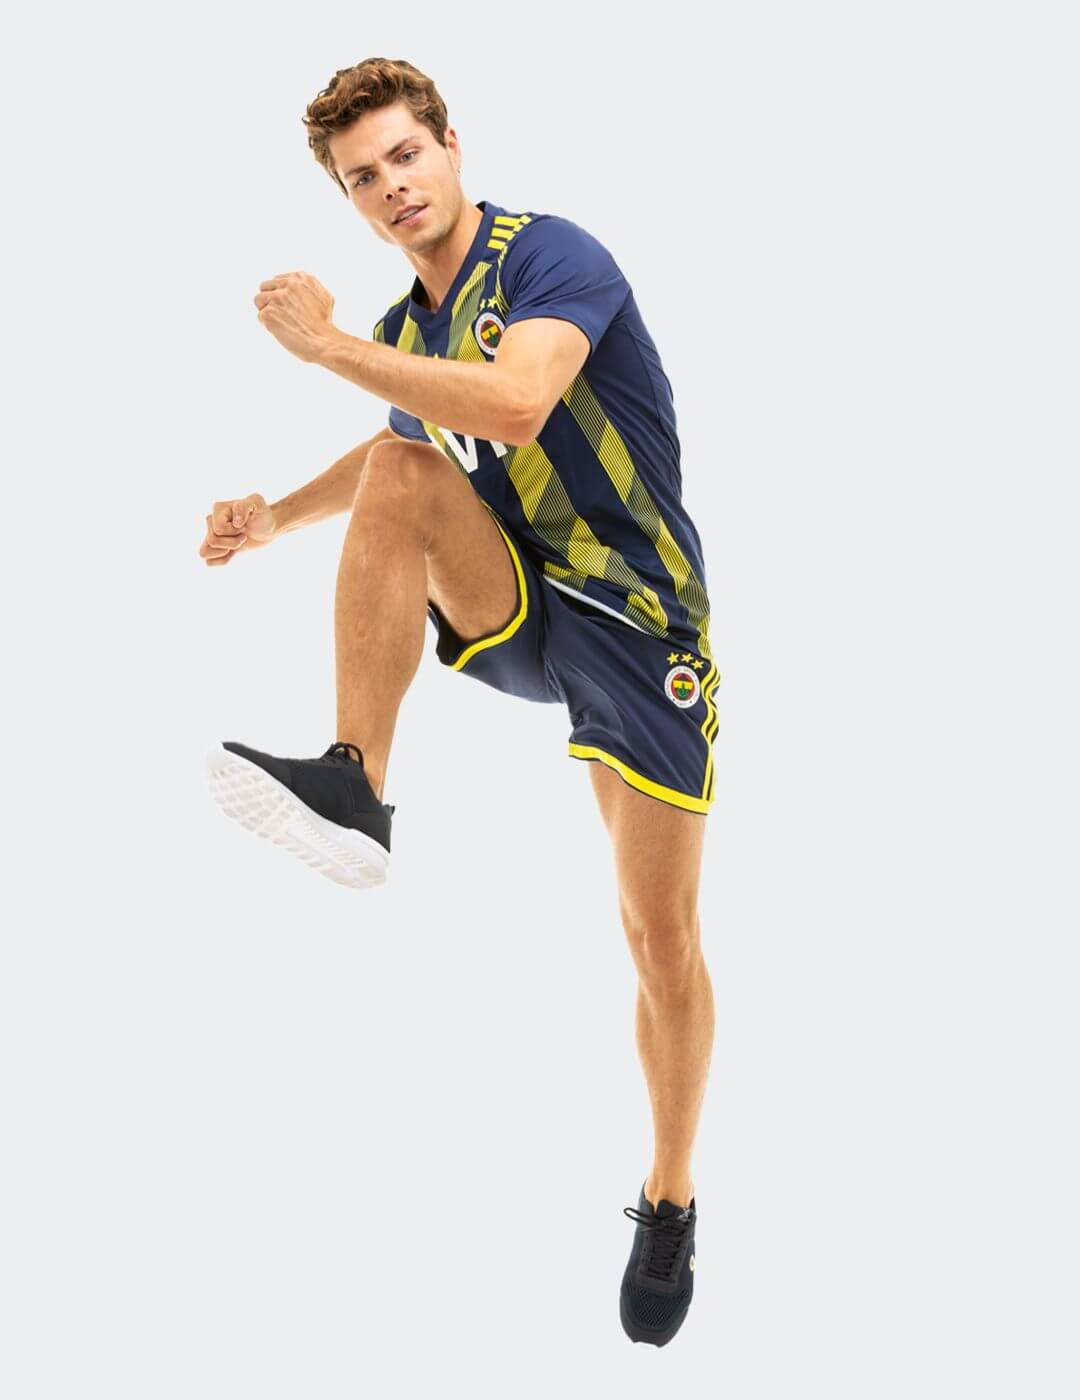 Fenerbahçe 19 Çubuklu Maç Forması